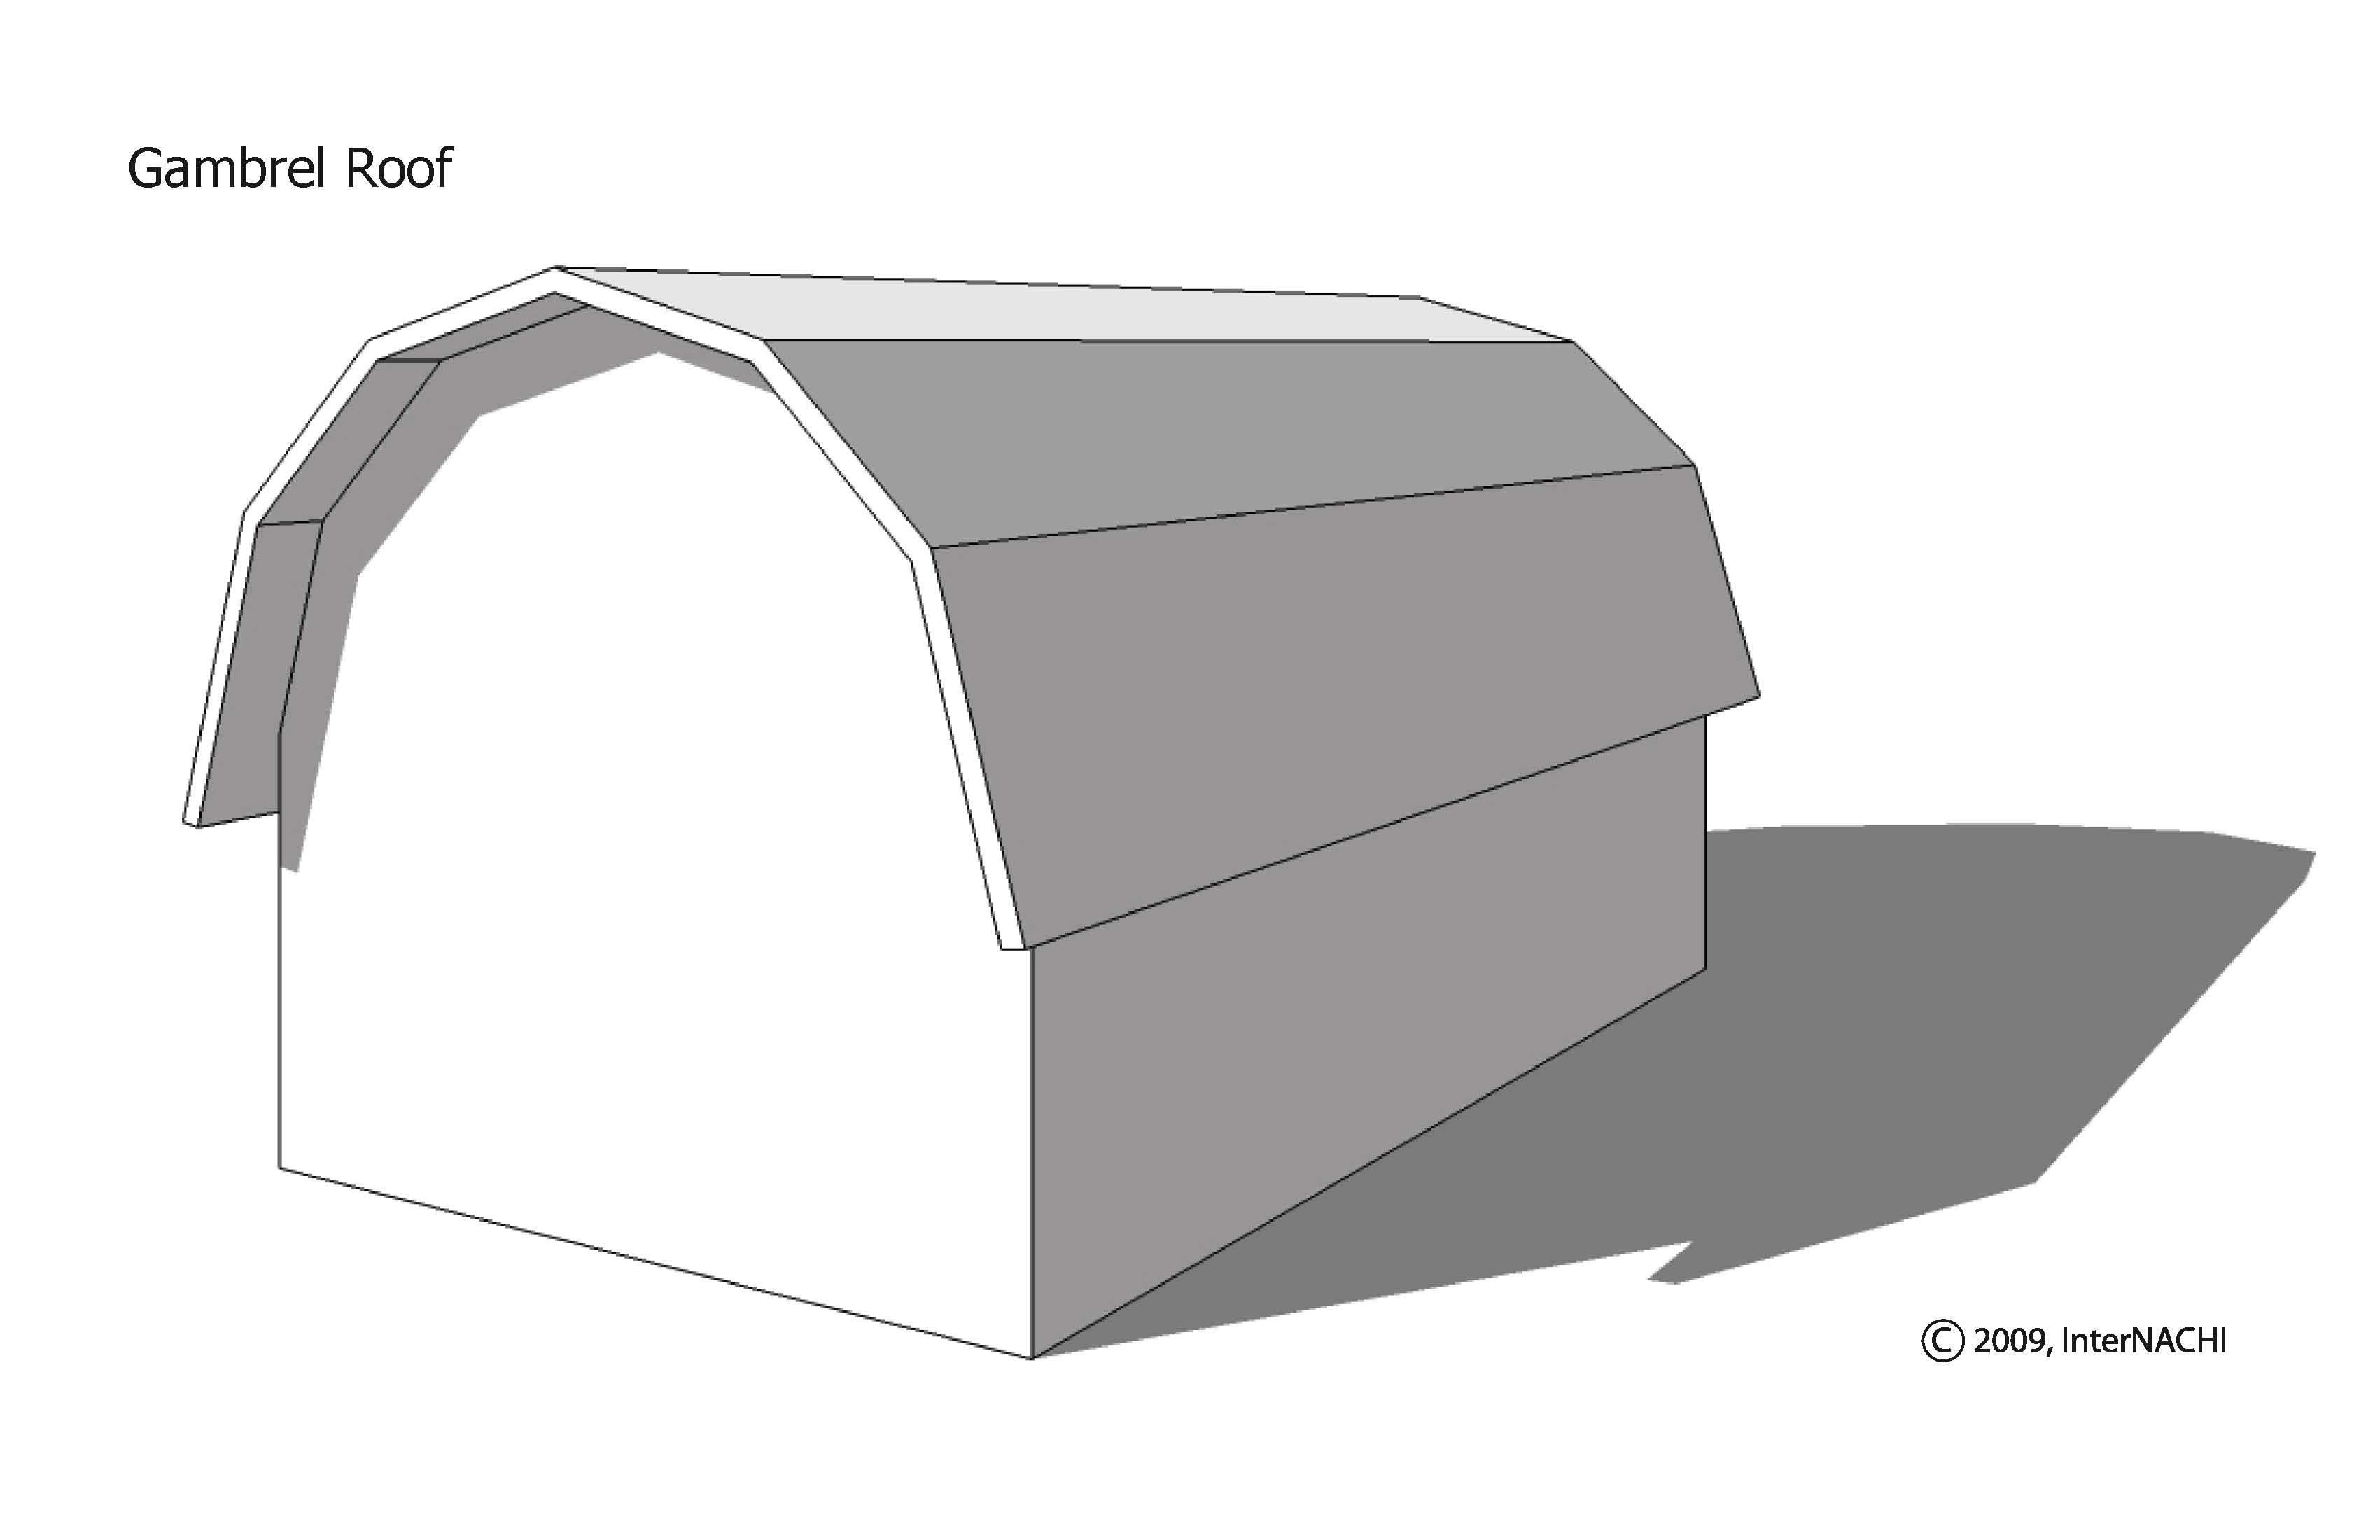 Gambrel roof.